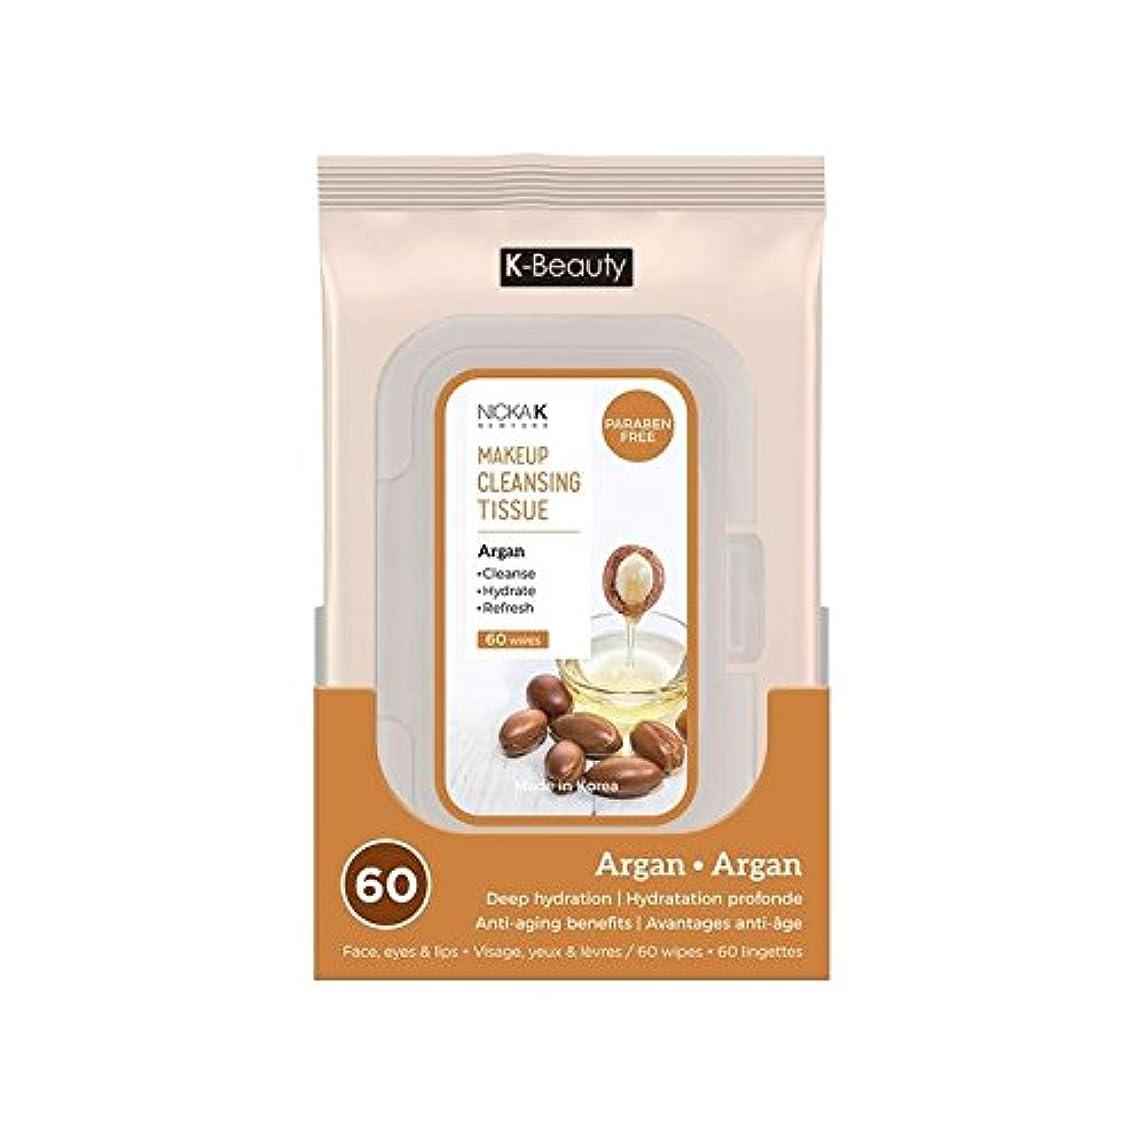 一見警察署急襲(6 Pack) NICKA K Make Up Cleansing Tissue - Argan (並行輸入品)